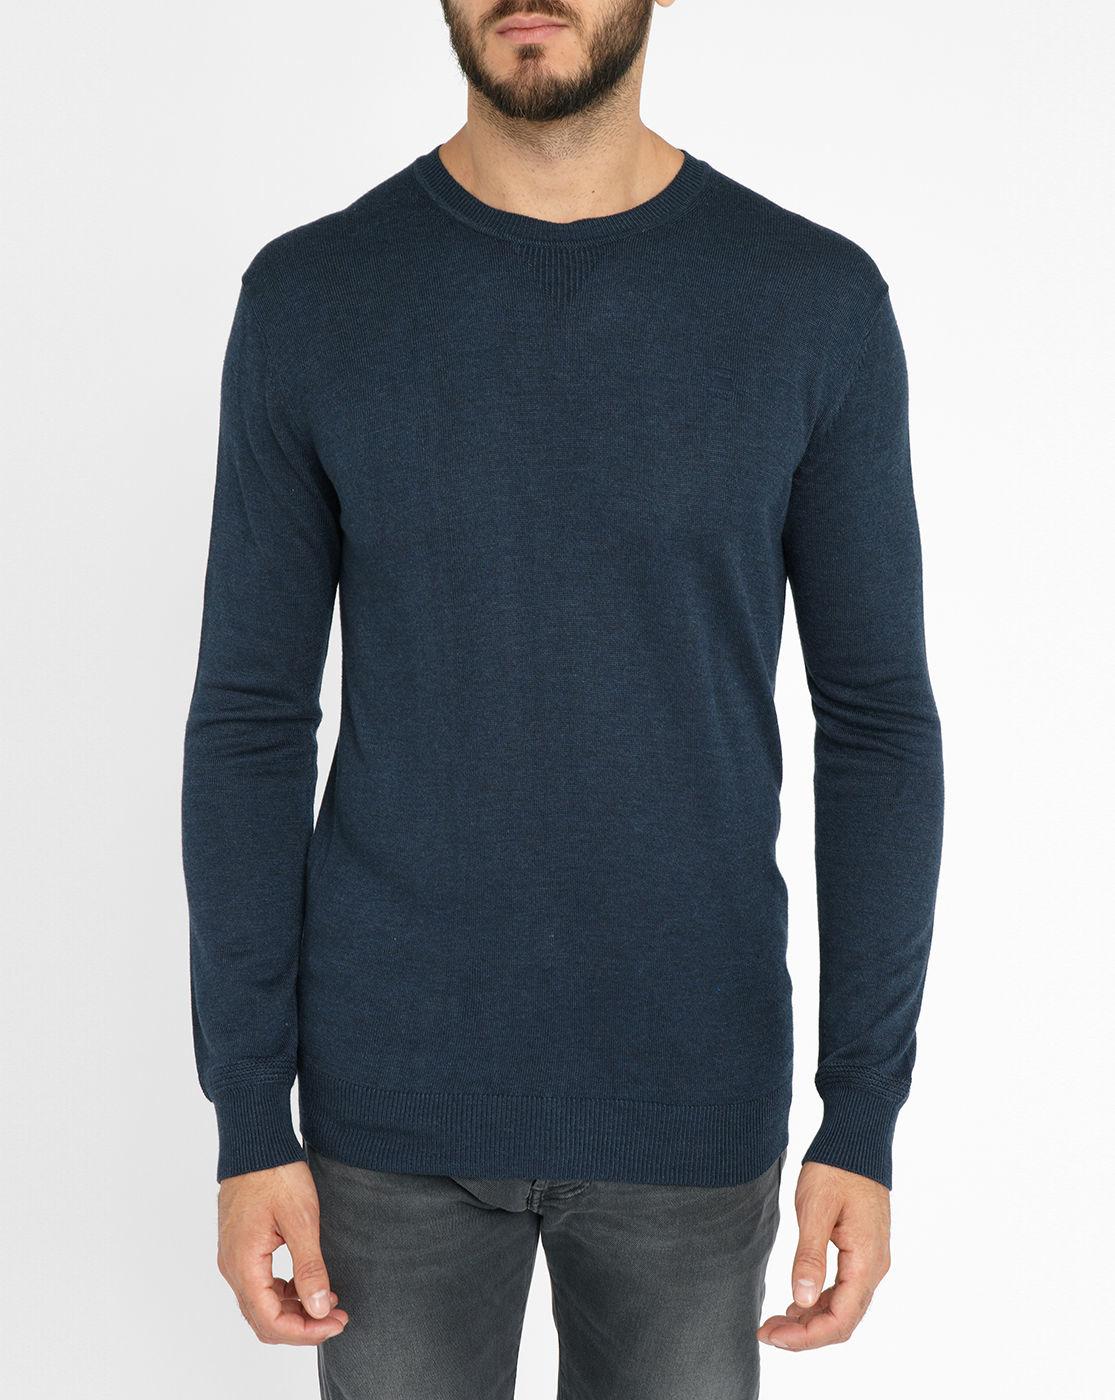 g star raw navy berlow knit chest logo round neck sweater. Black Bedroom Furniture Sets. Home Design Ideas